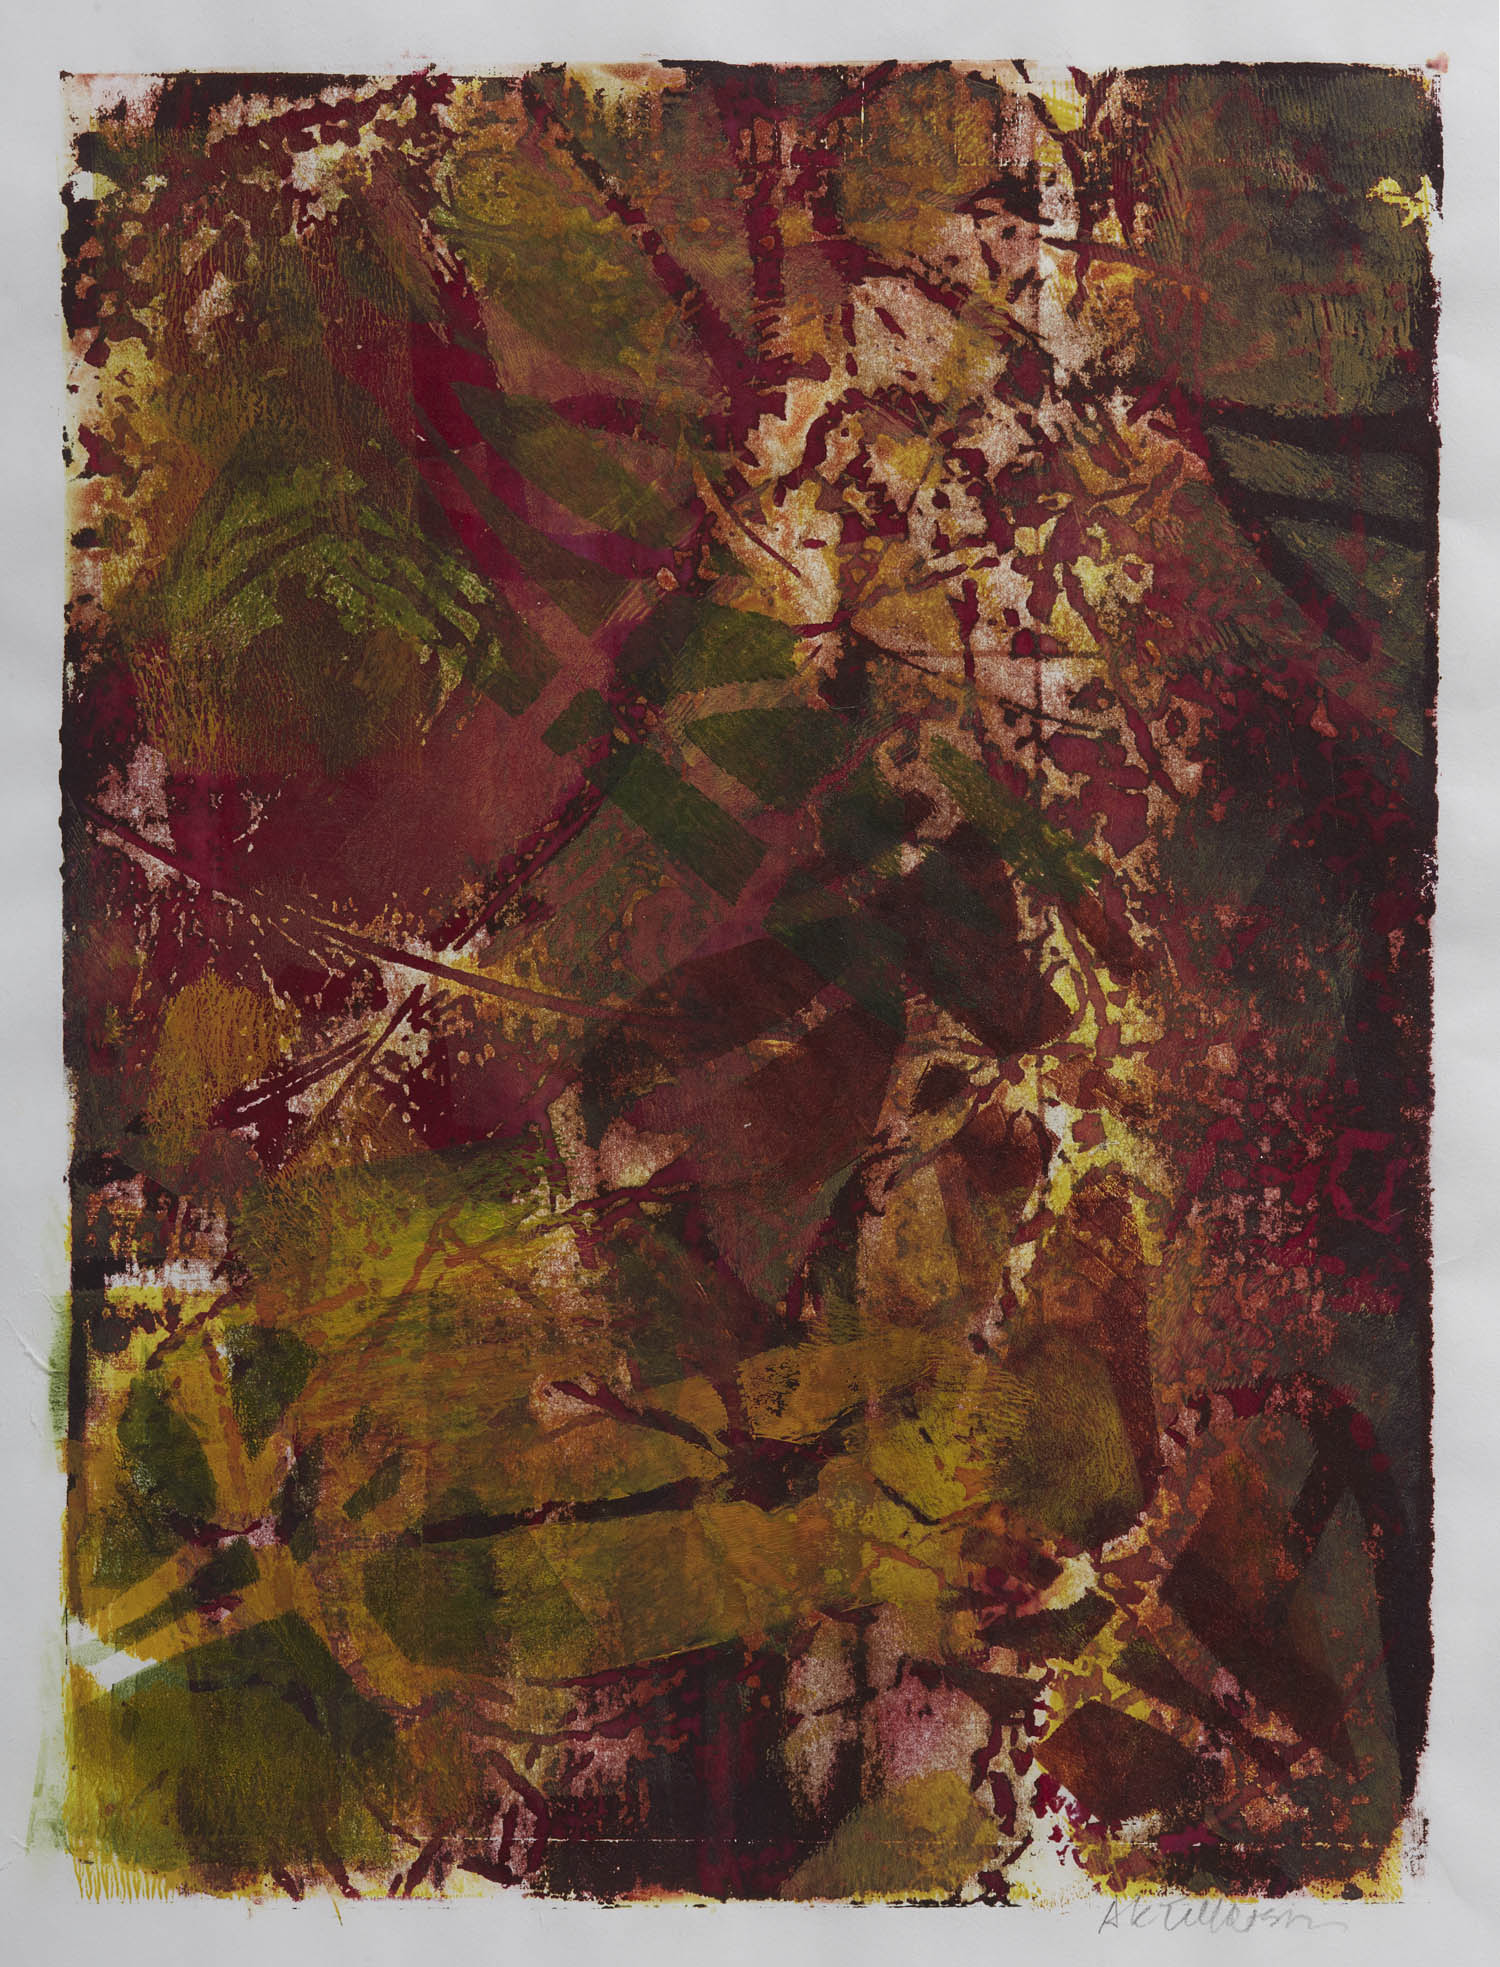 Semblance III by St. Paul, MN multimedia artist, Amy Tillotson